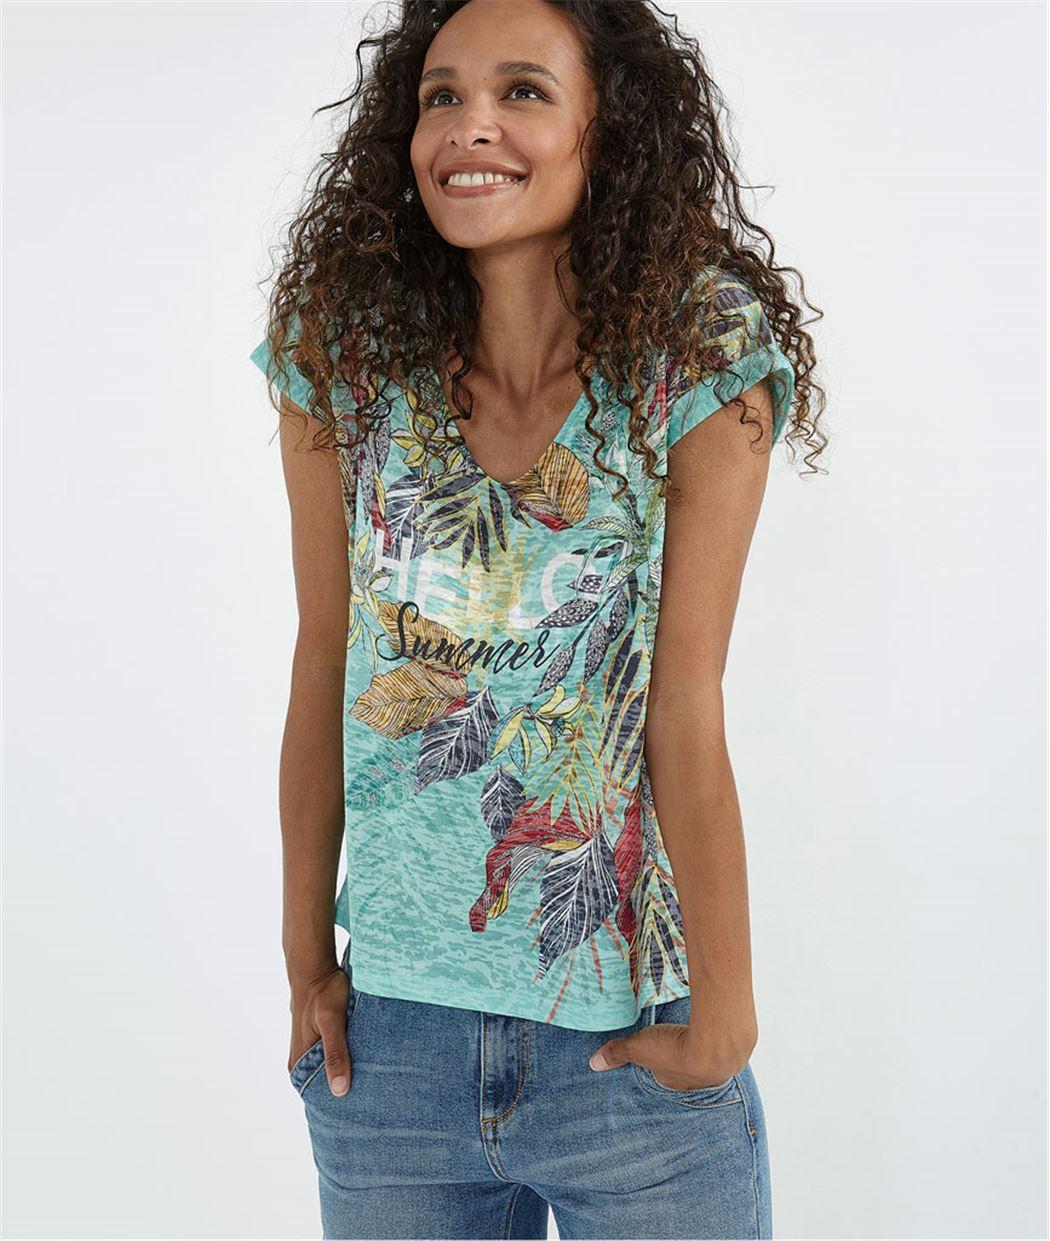 T-shirt turquoise imprimé feuillages TURQUOISE